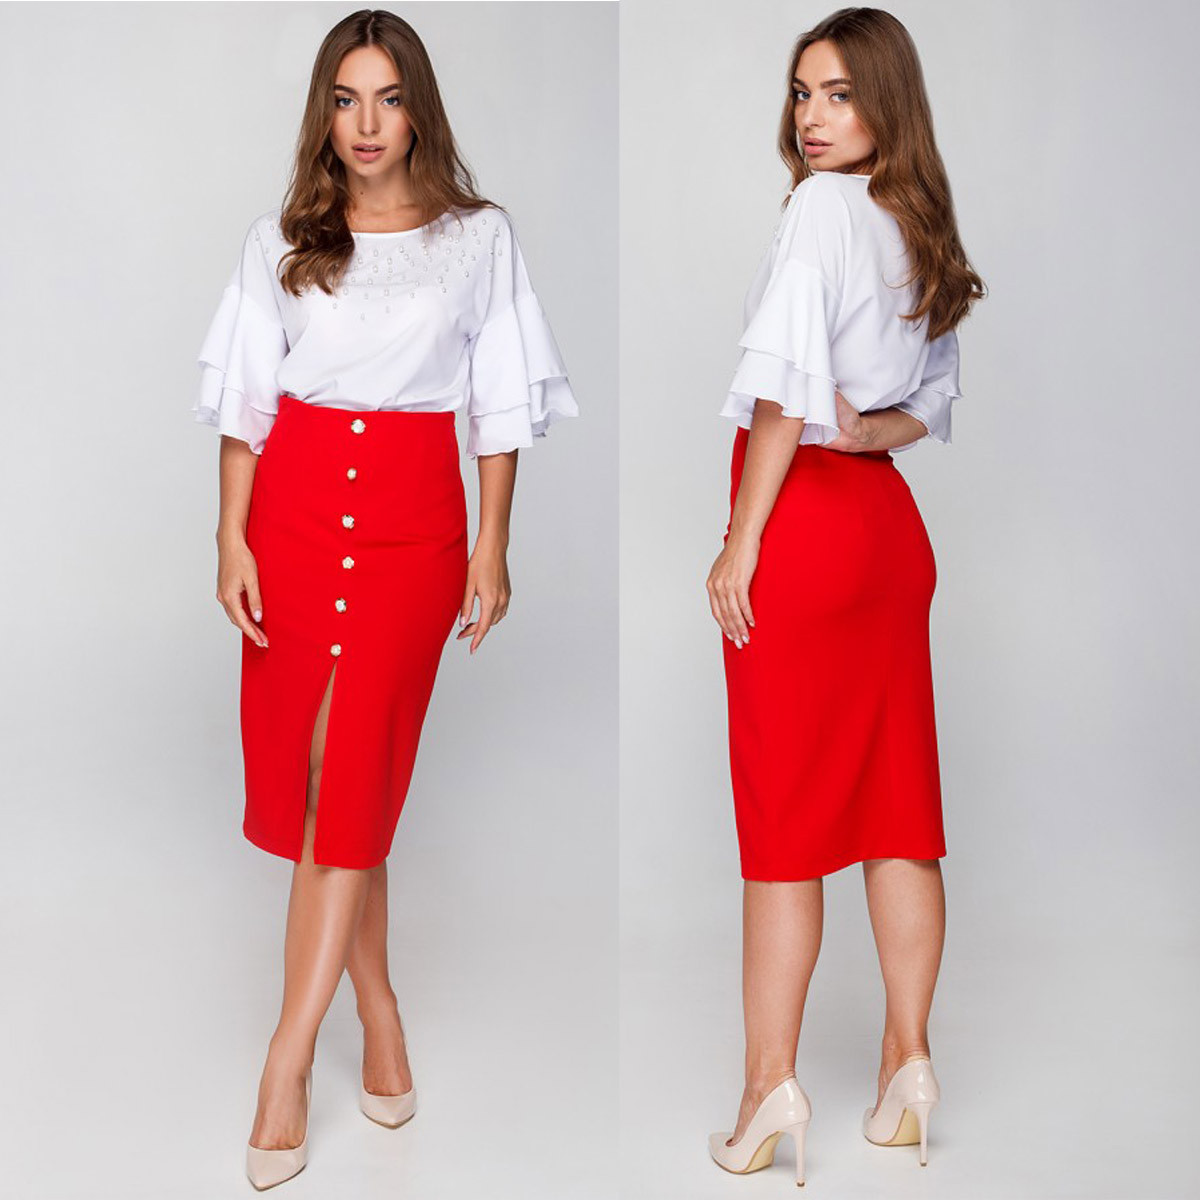 4199c181750 Деловая красная юбка карандаш размер M